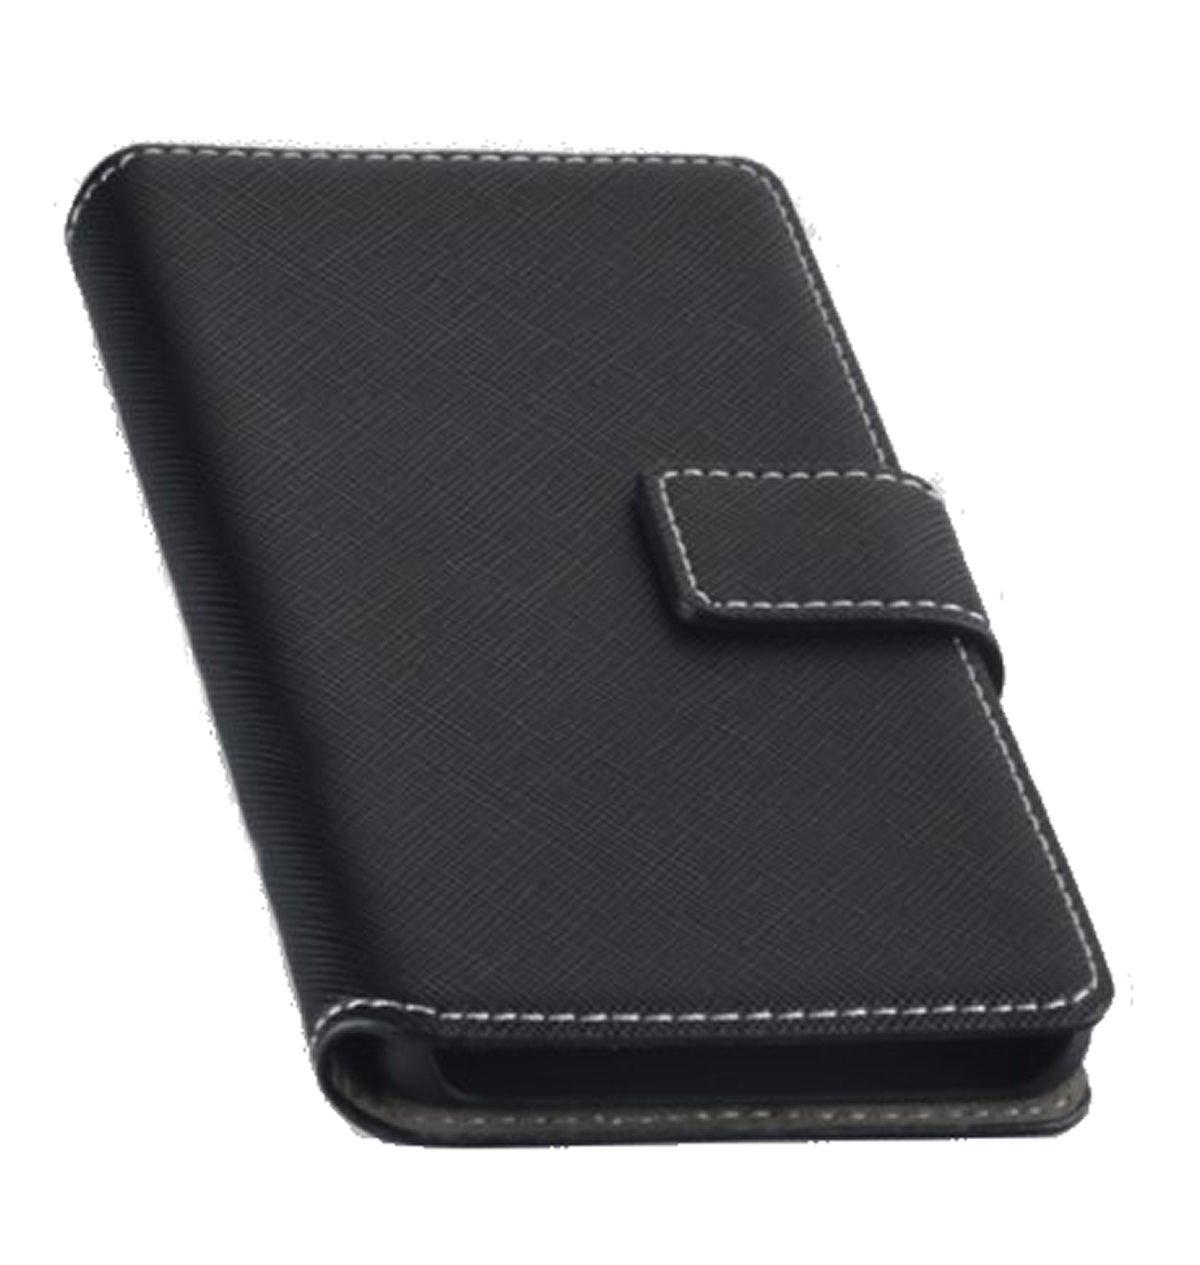 - NAS - HTC Desire Desire Desire HTC 828用ブックケース - - 628保護ケース保護カバーケースブラック - (Bulk) B01M4MJQFC, ナンガイムラ:d45fc490 --- cooleycoastrun.com